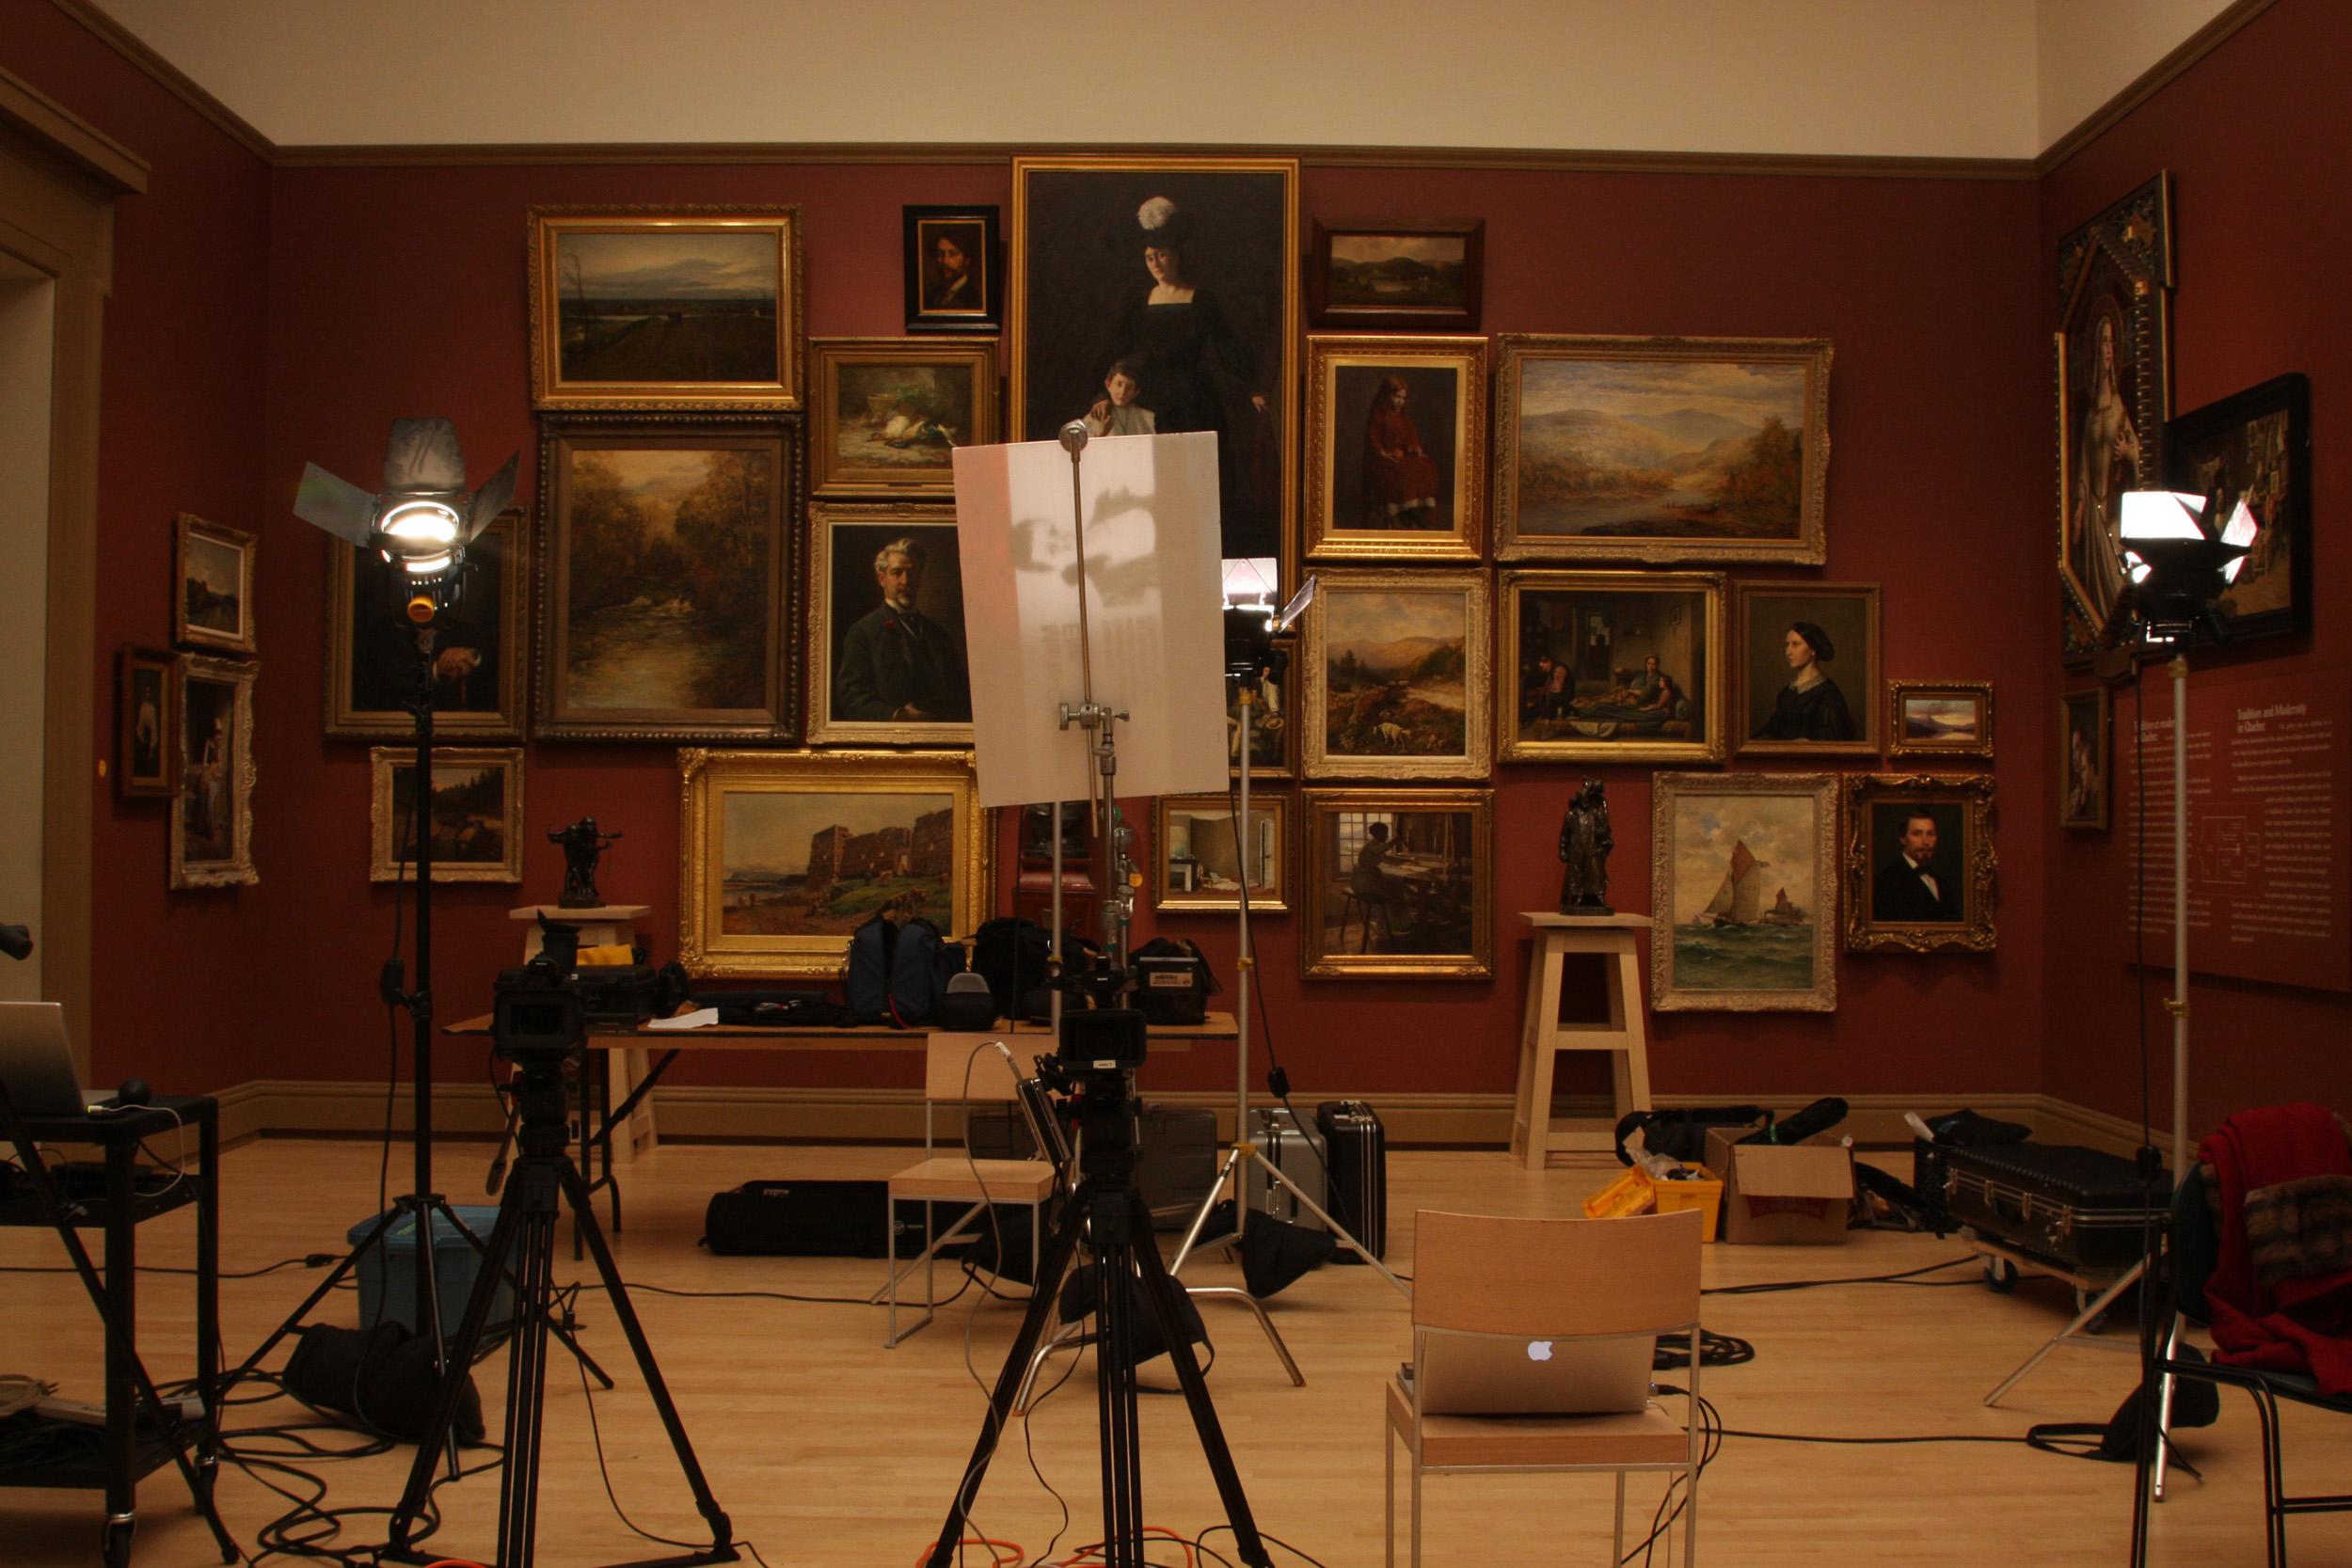 2008_Mirroring_The_Musee_Making_Of_1.jpg